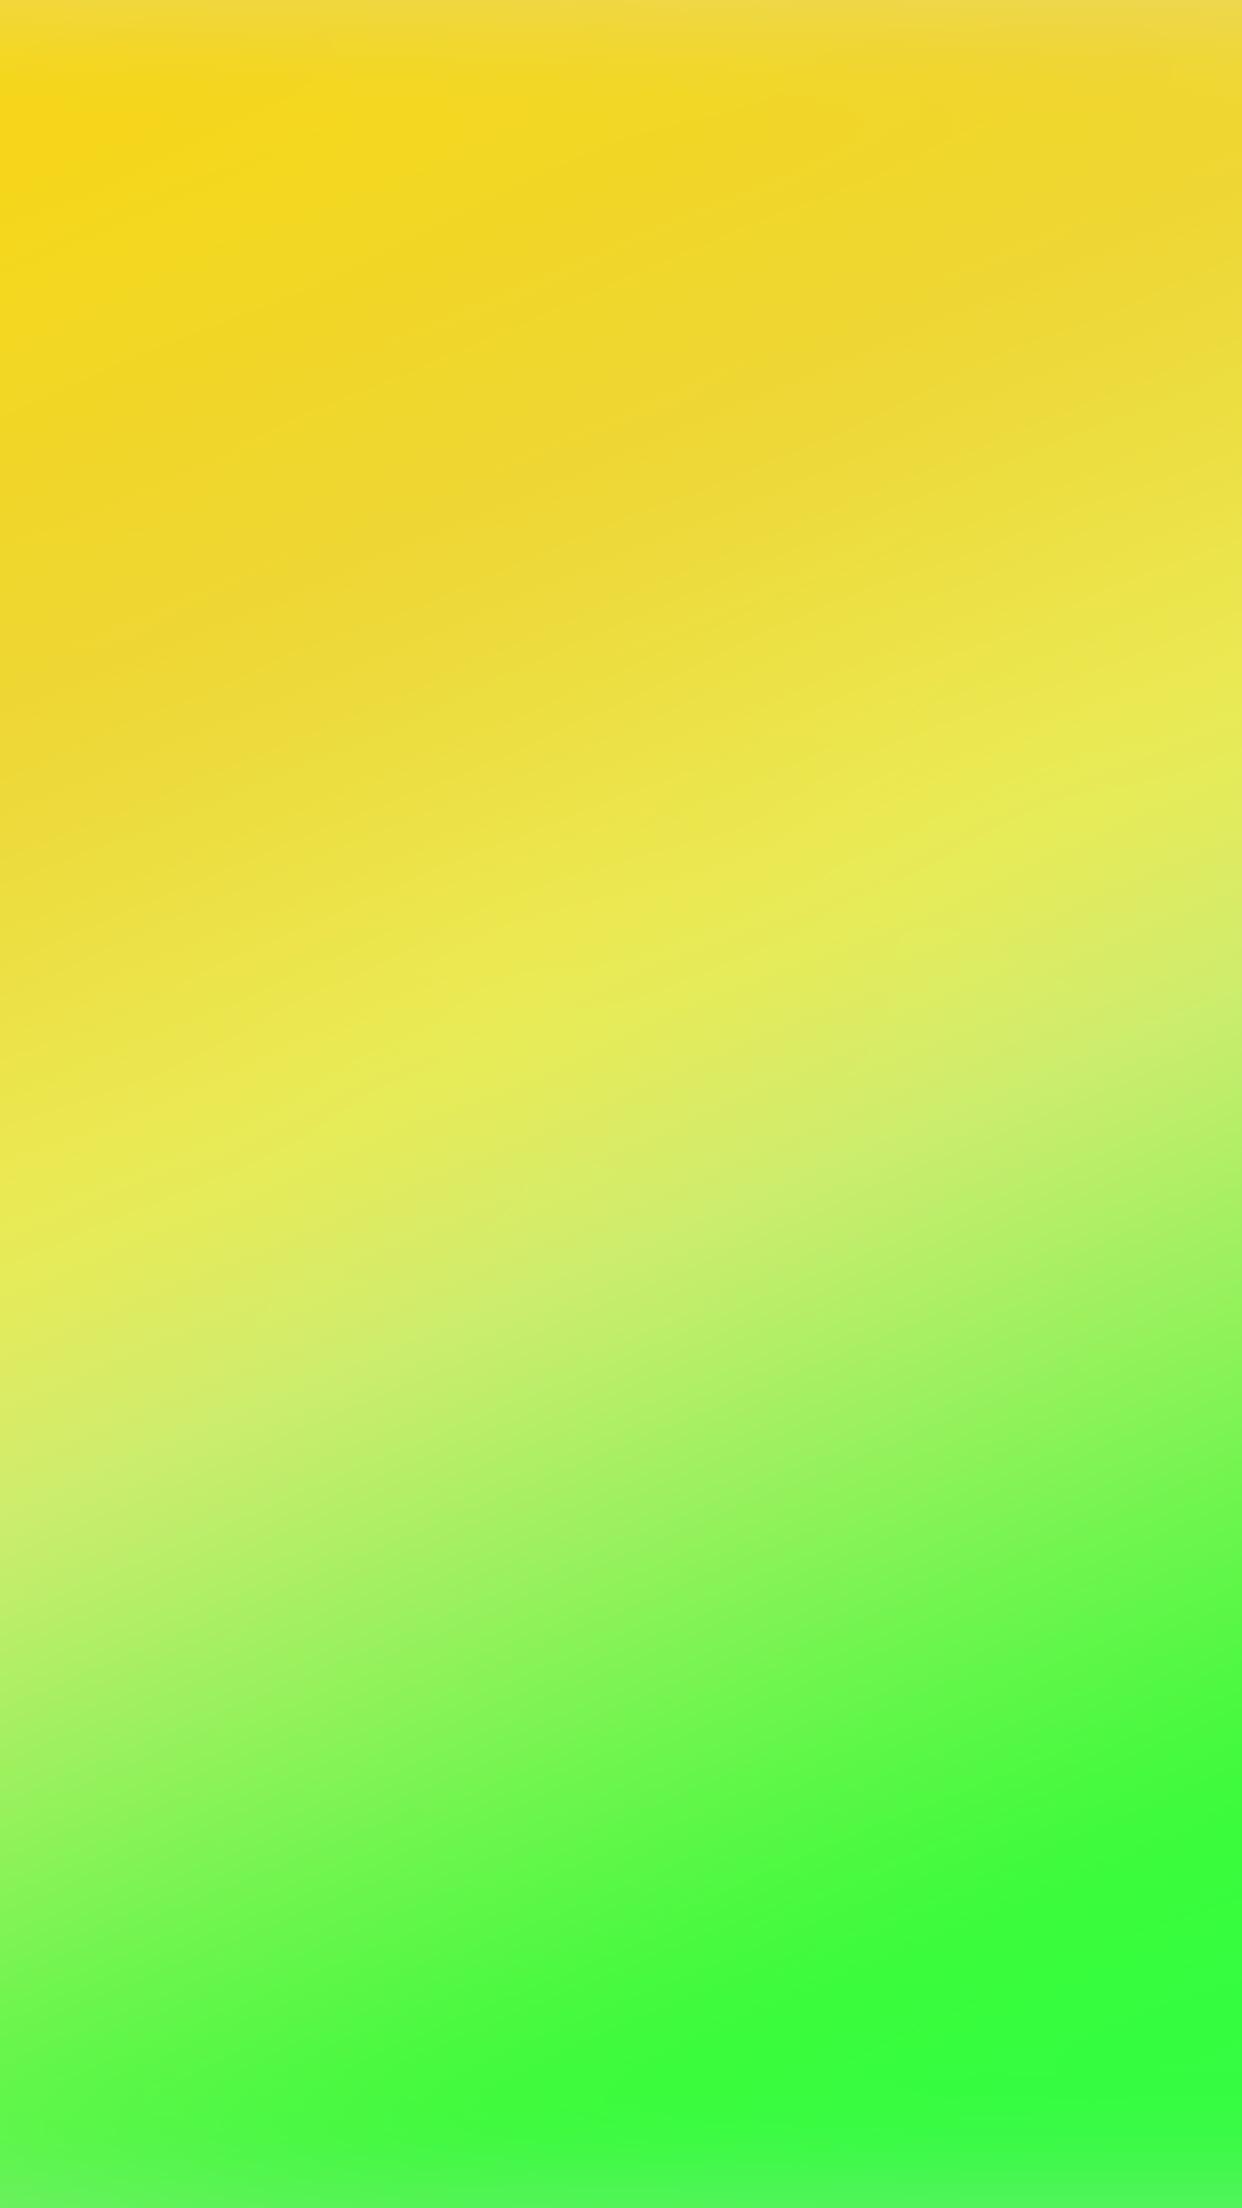 Yellow And Green Living Room Decor: Sl79-yellow-green-blur